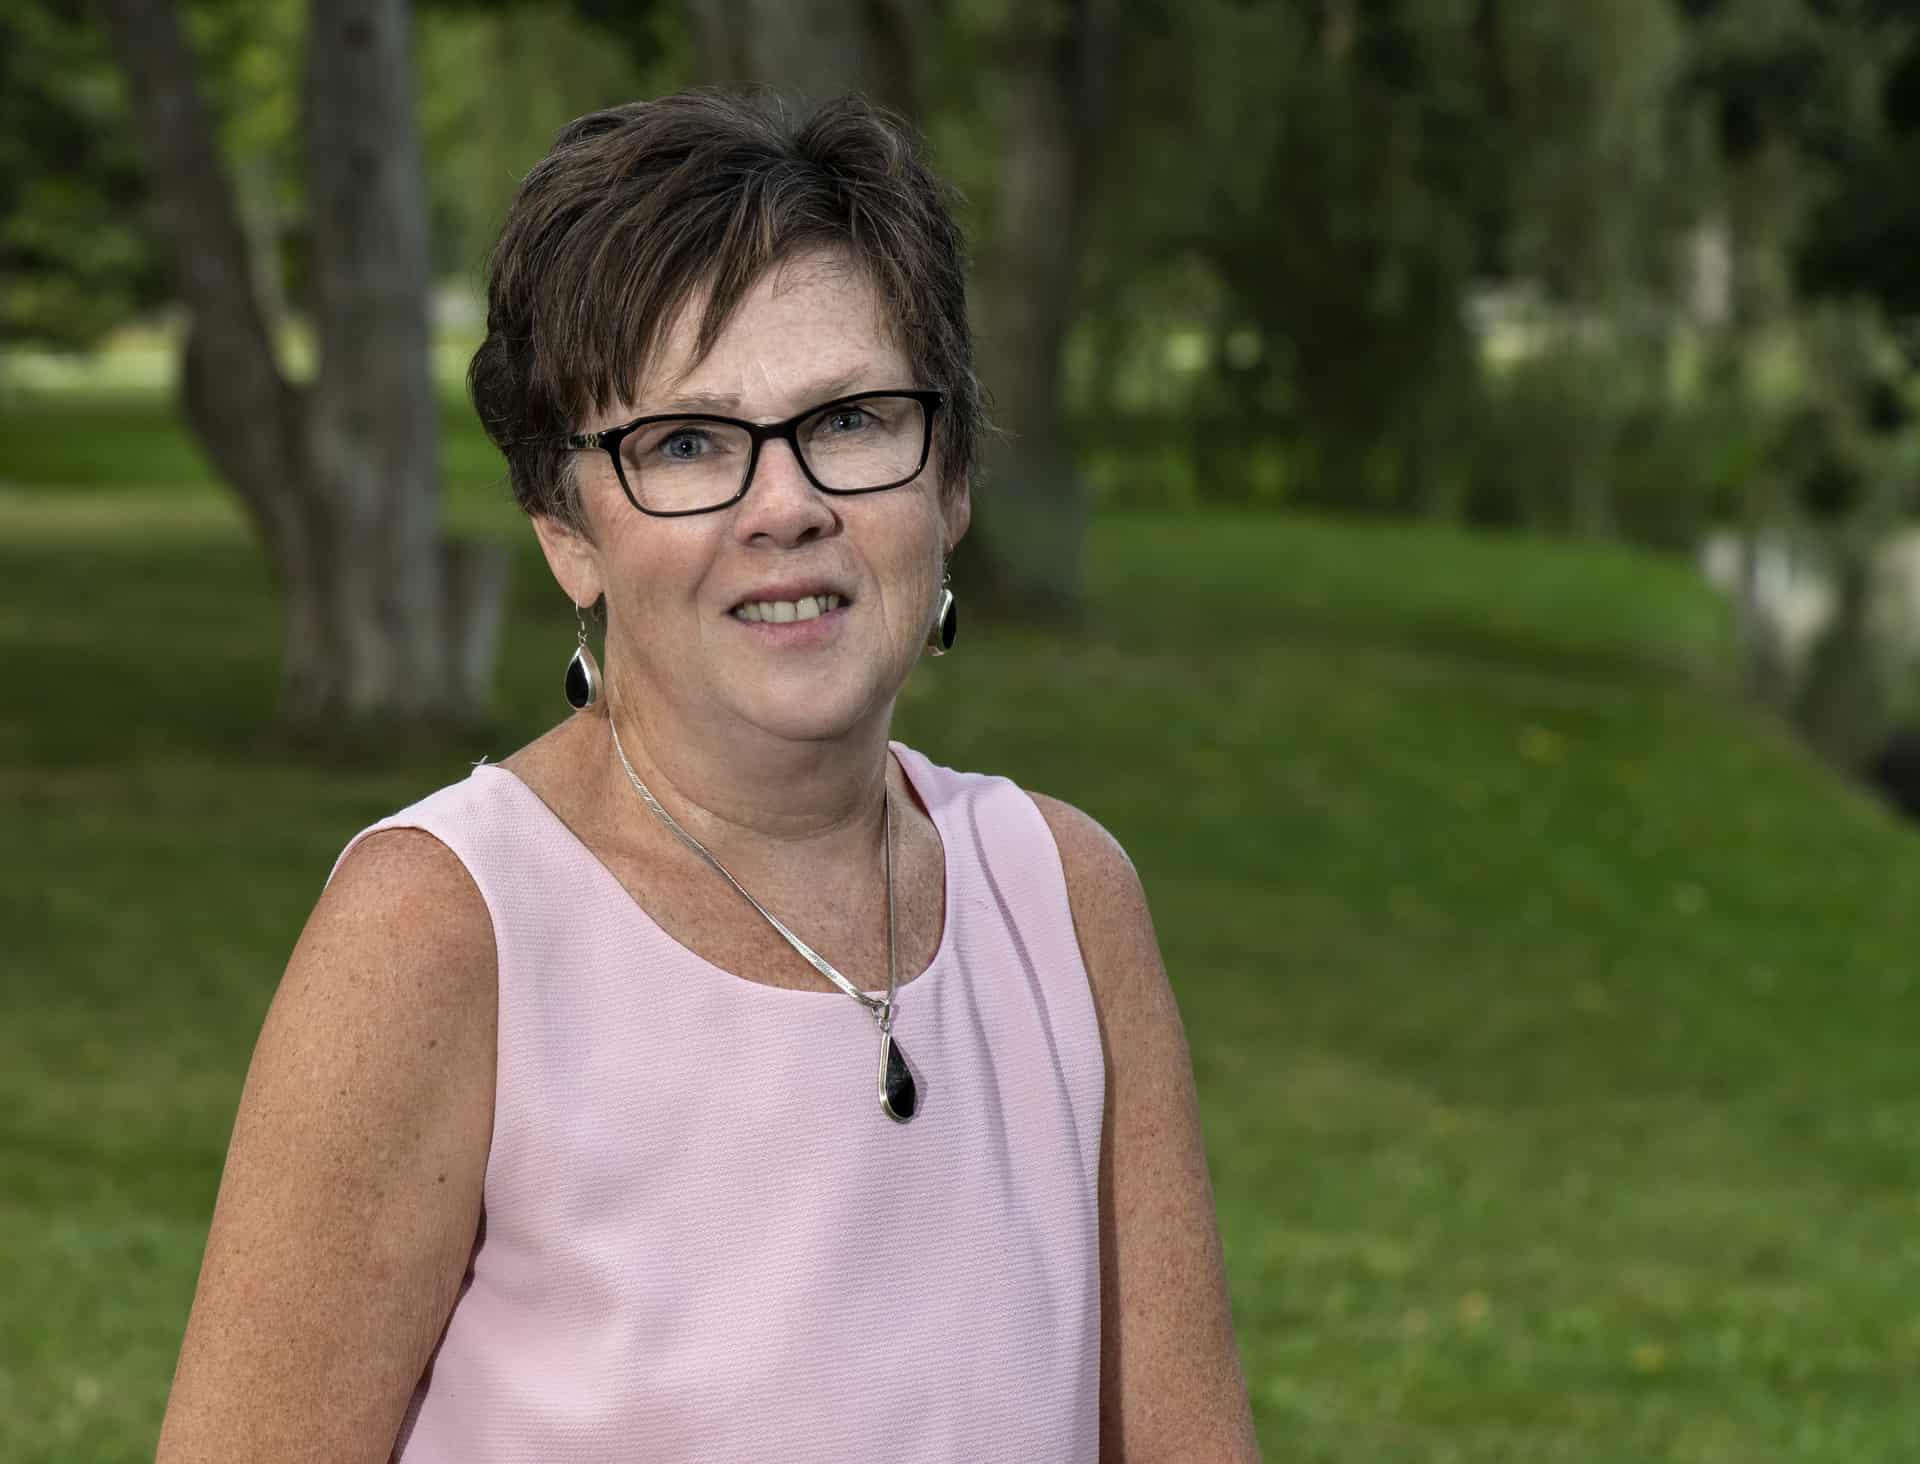 Susan K. Millotte